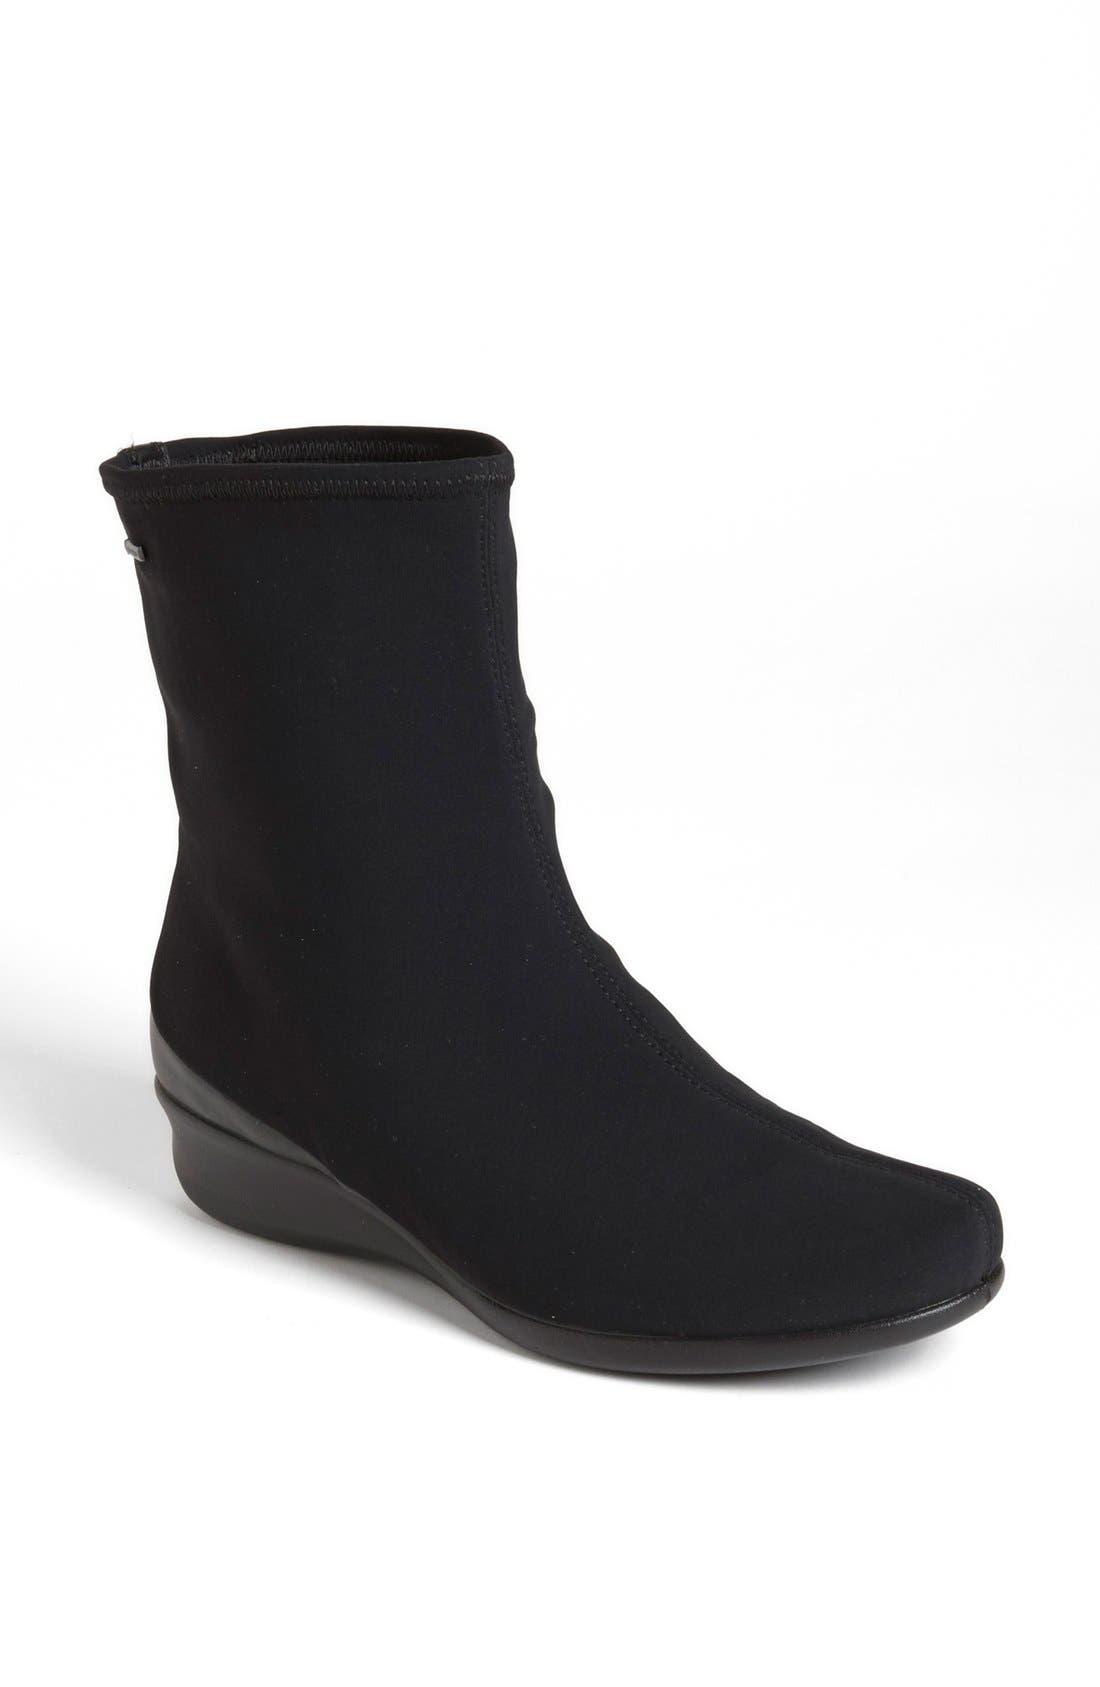 'Abelone' Boot,                             Main thumbnail 1, color,                             Black